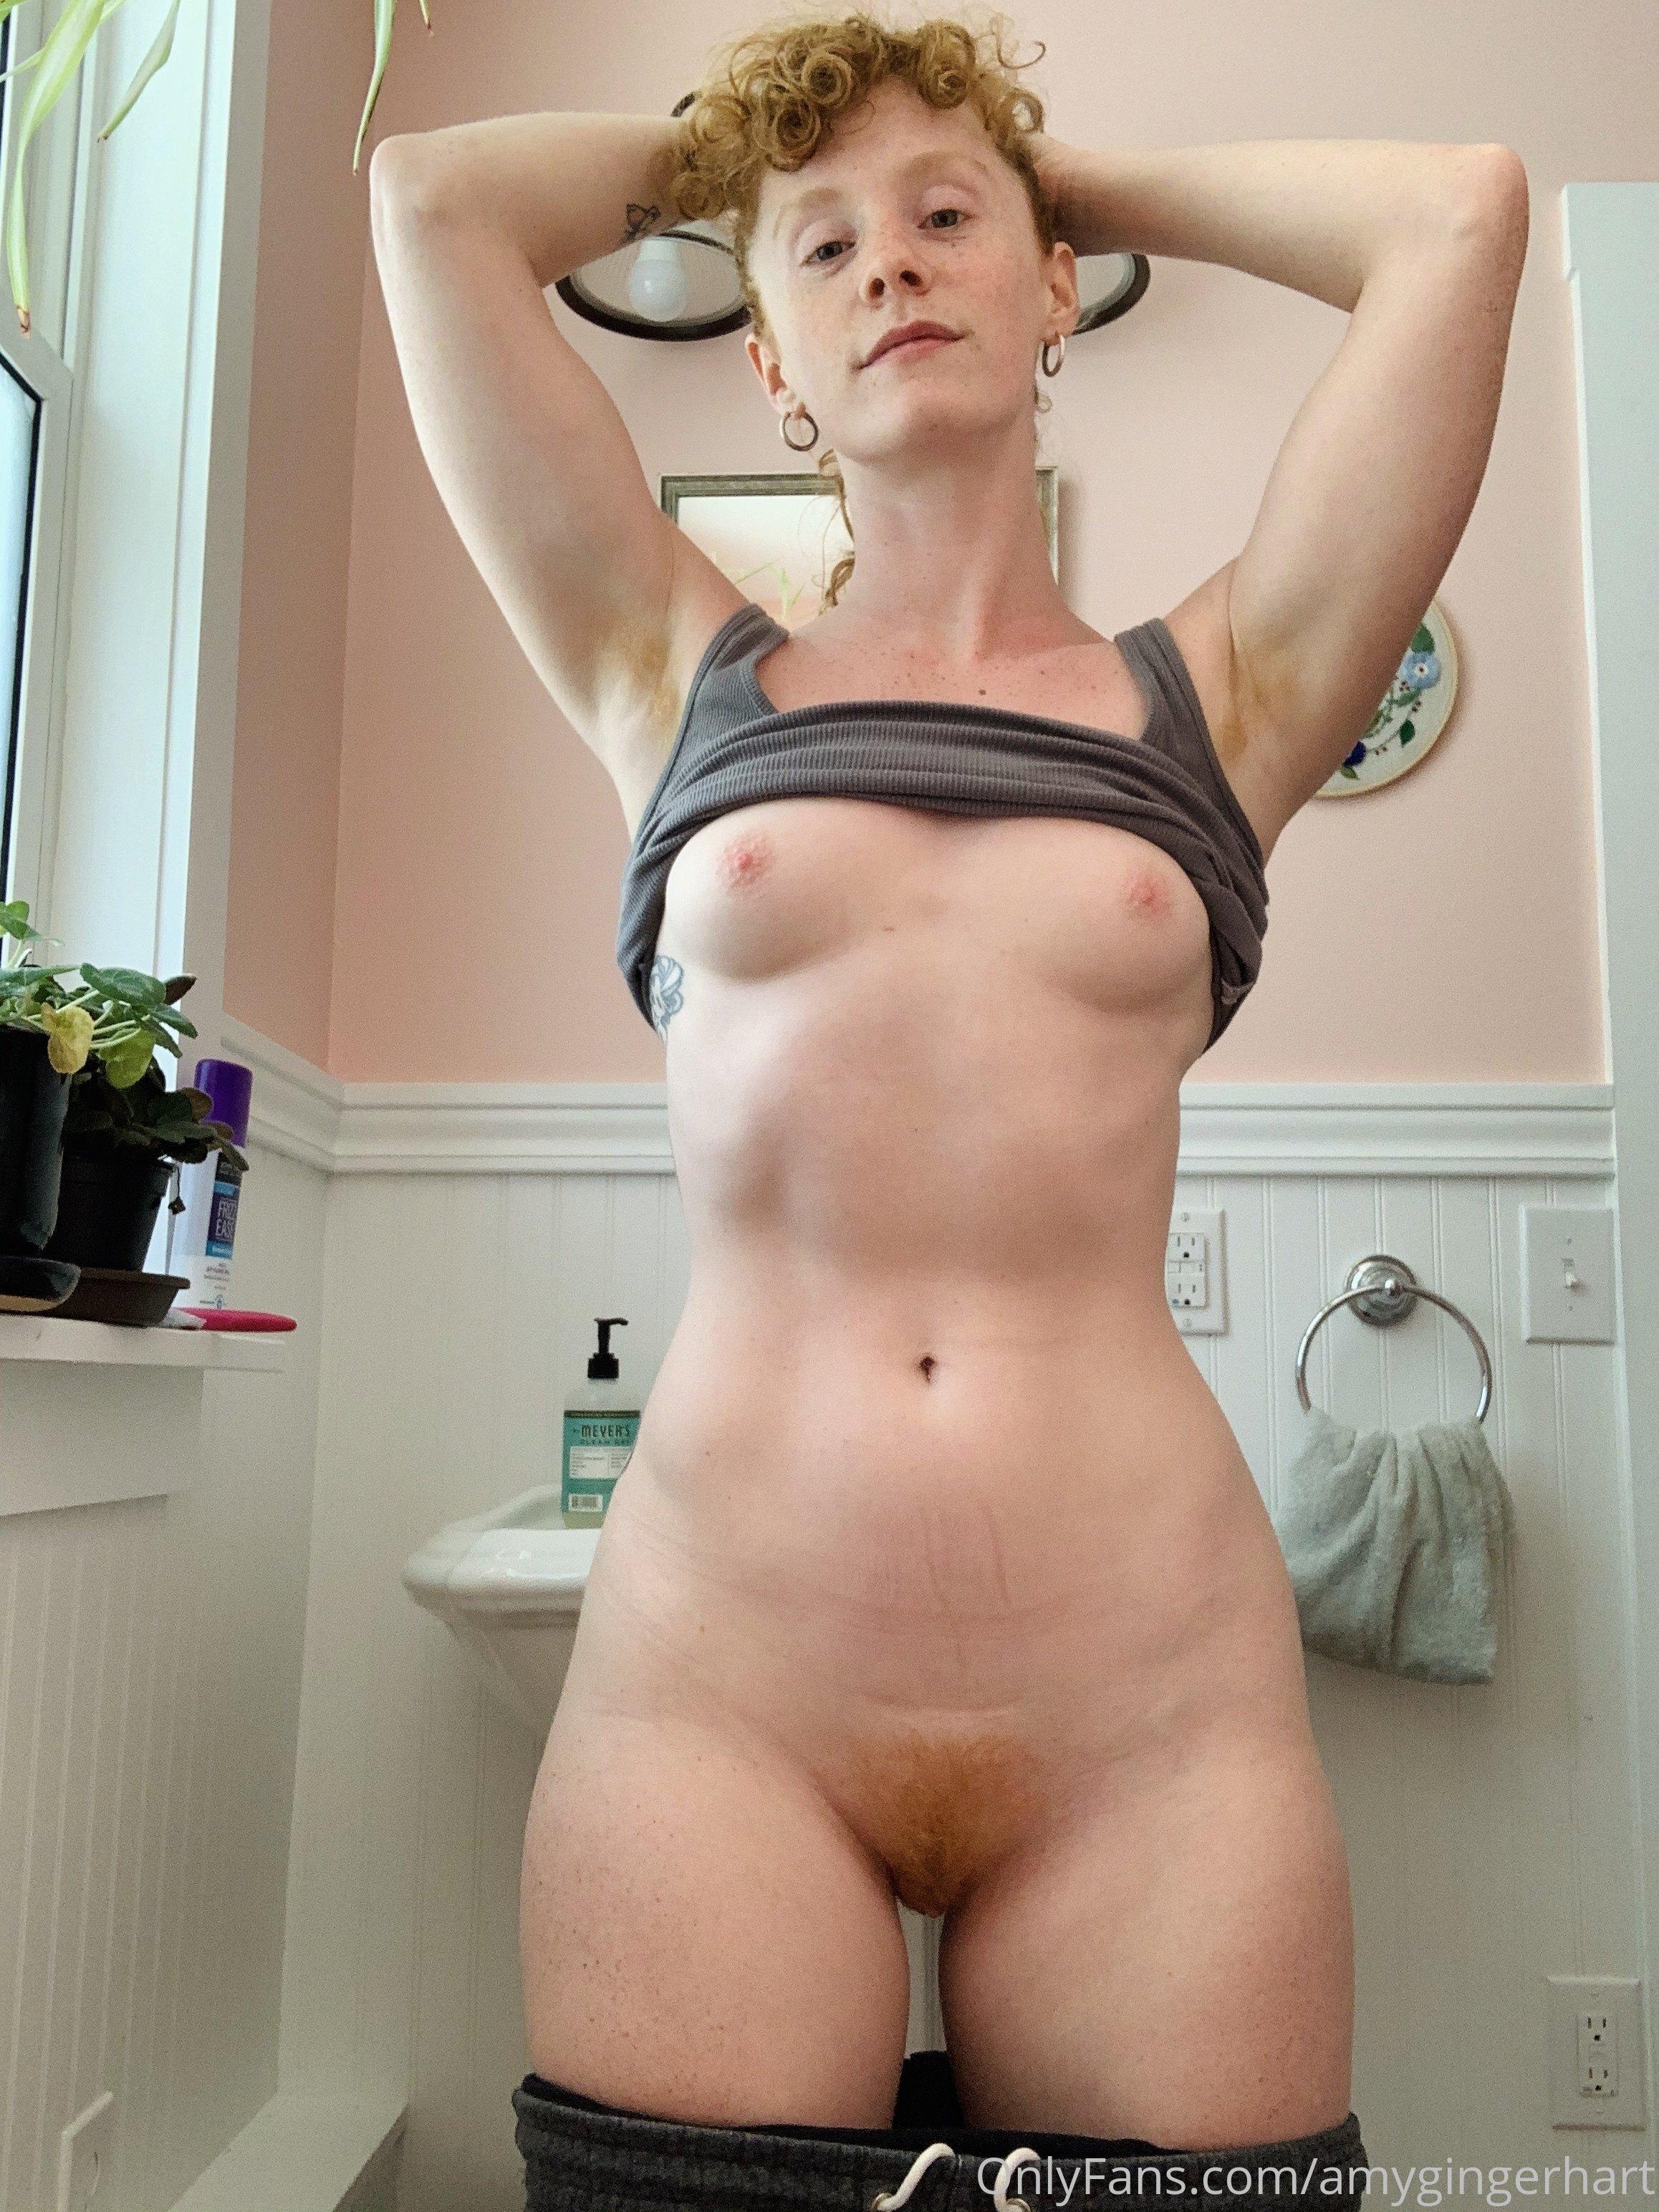 Amy Hart, Amygingerhart, Onlyfans 0306